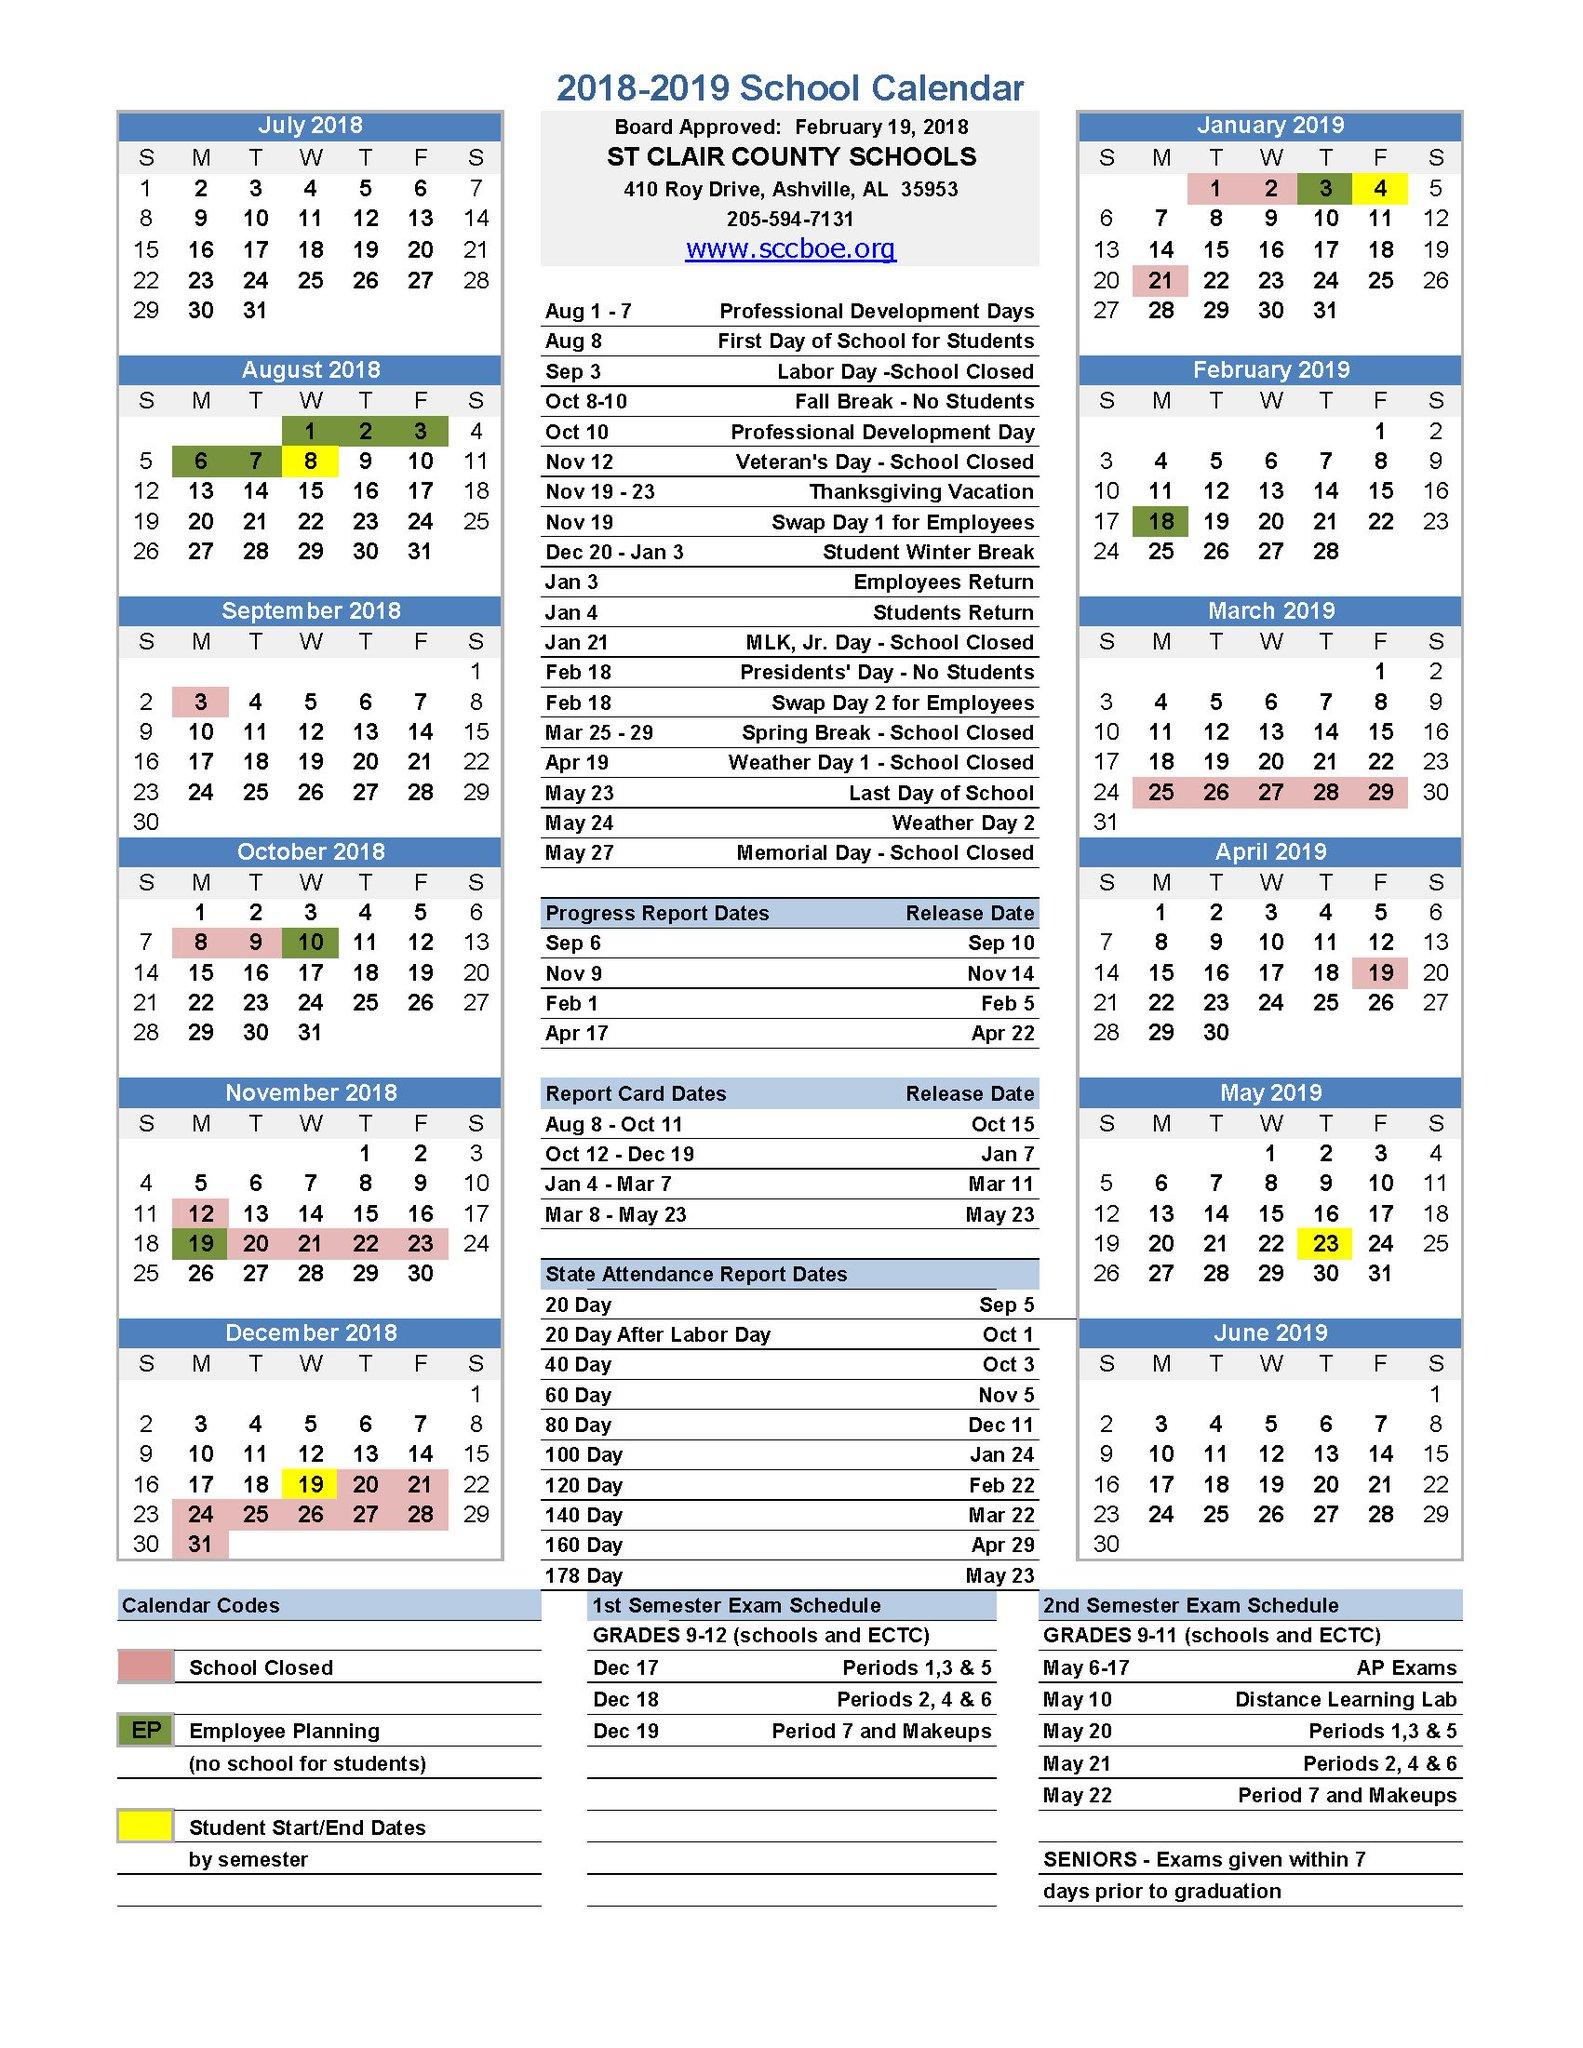 St Clair County School Calendar 2019 St. Clair County Schools on Twitter: